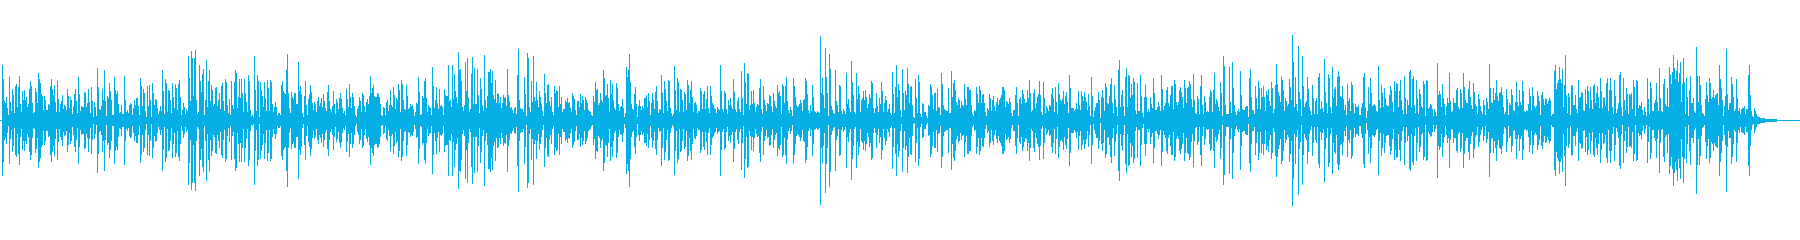 【JAZZ】オシャレな店舗で流れるBGMの再生済みの波形